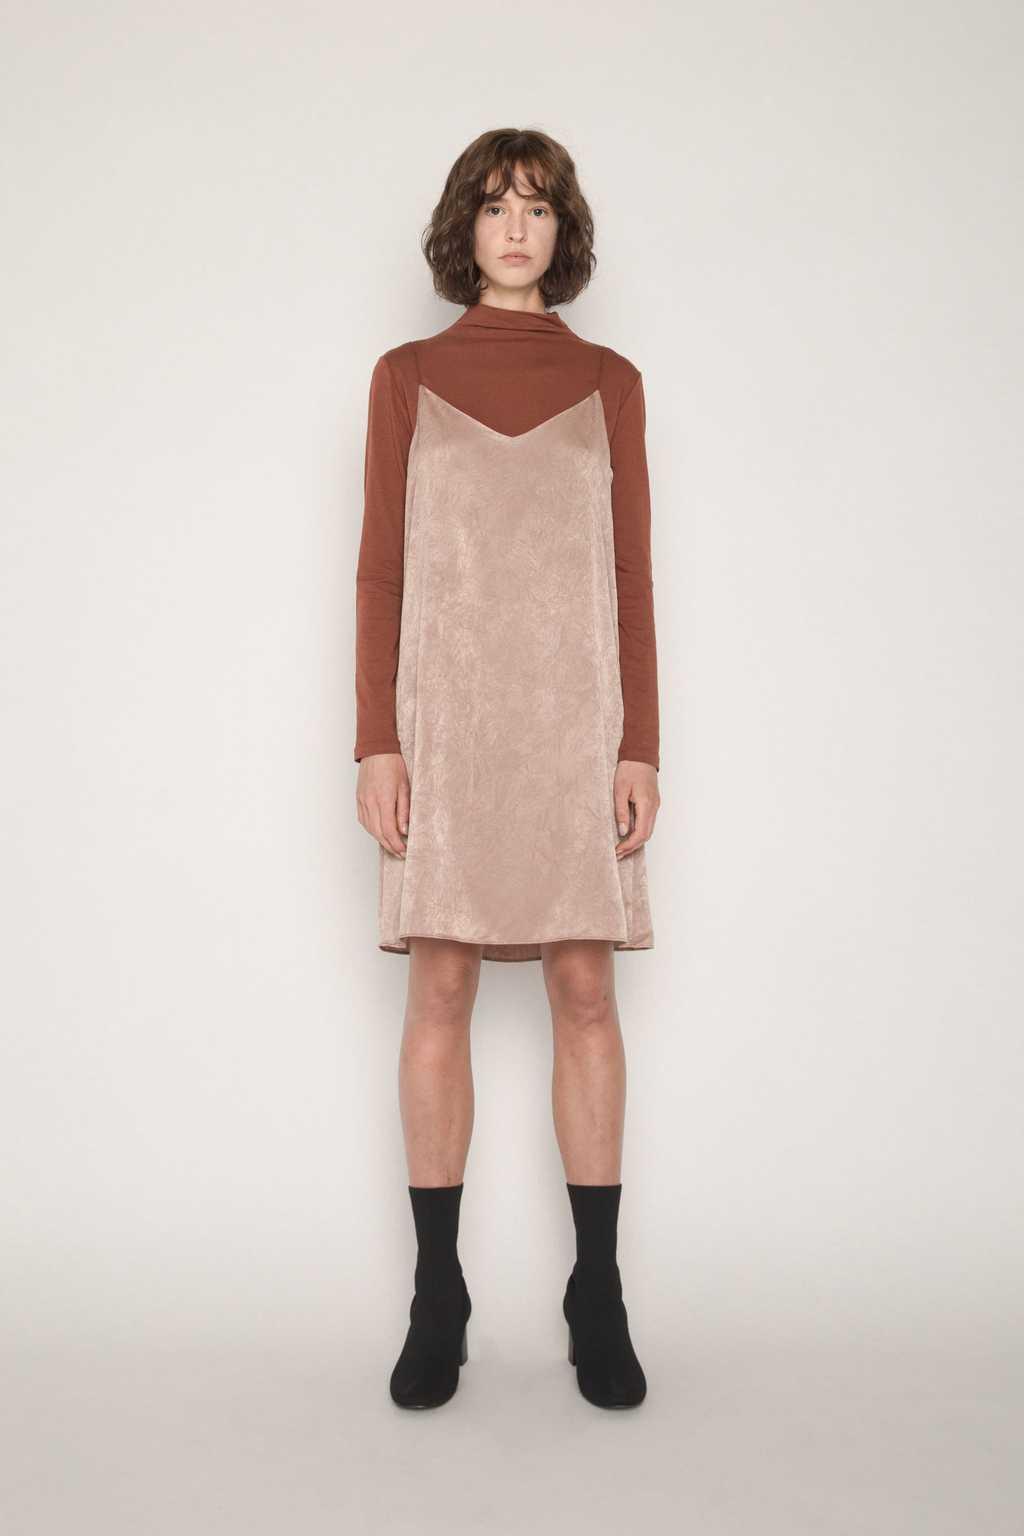 Dress H233 Beige 1